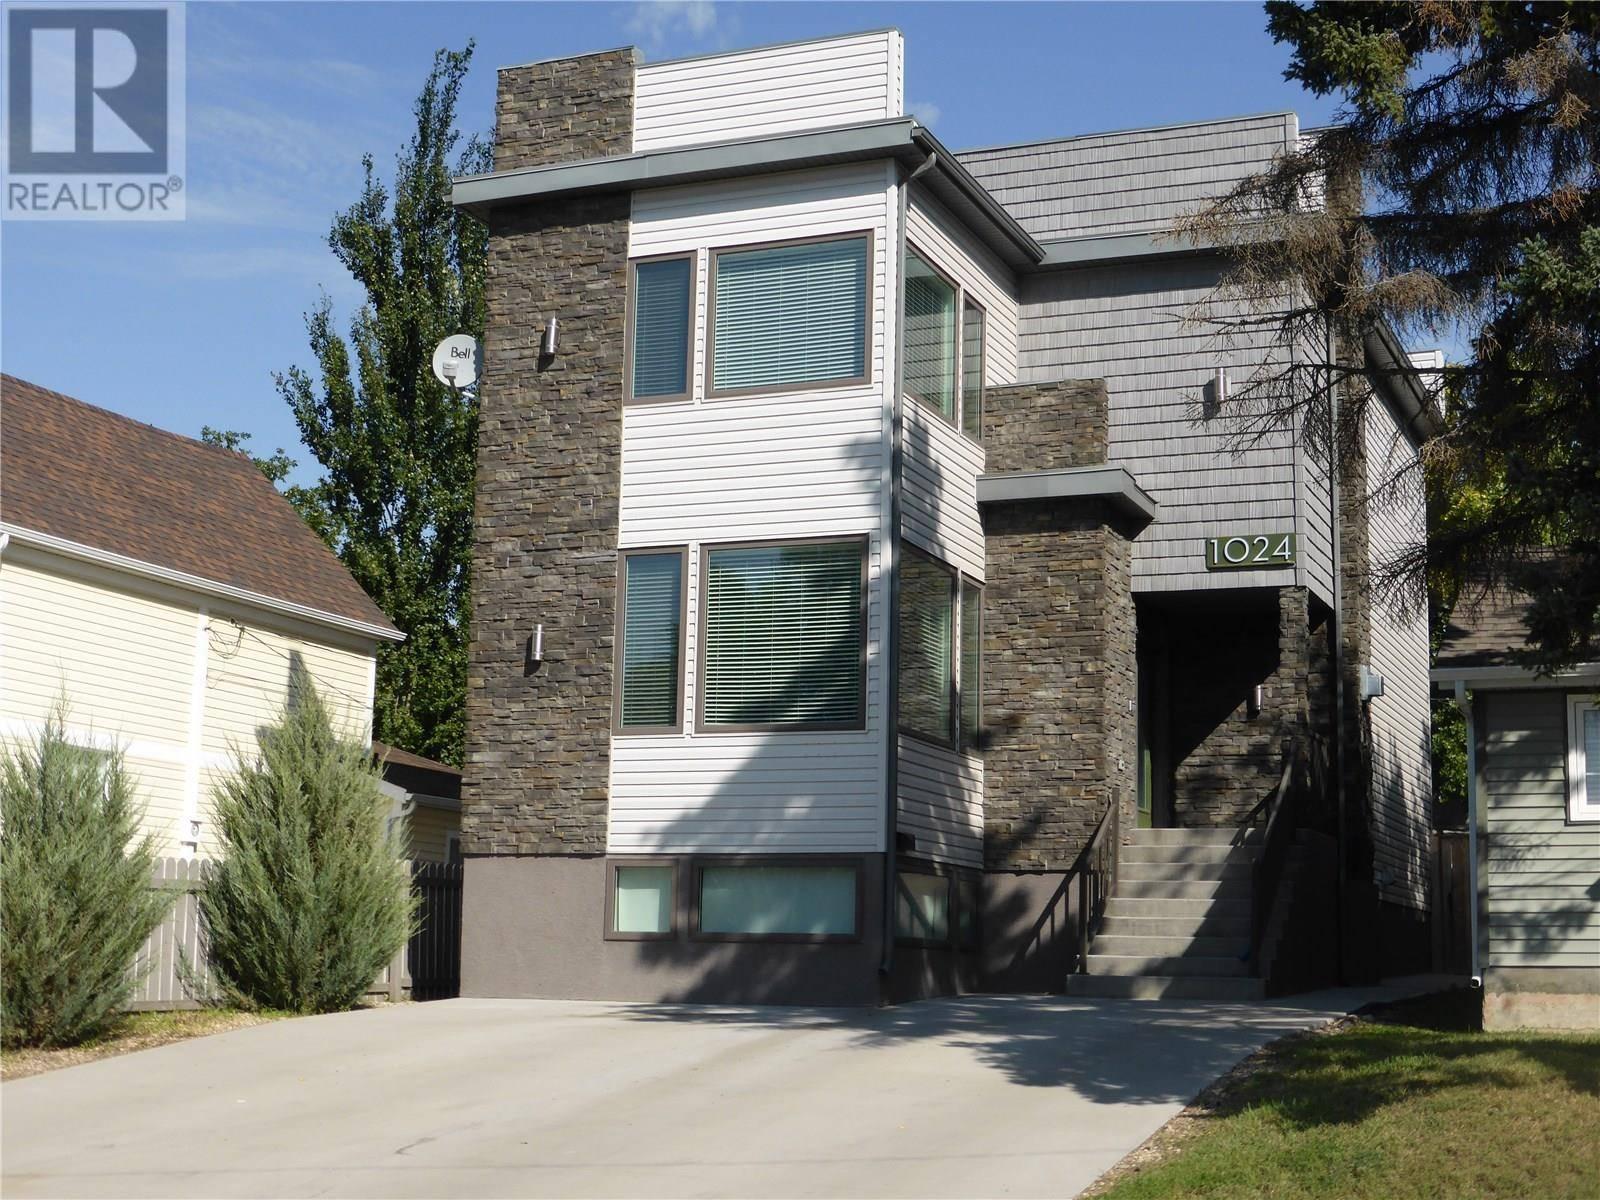 House for sale at 1024 Hochelaga St W Moose Jaw Saskatchewan - MLS: SK785701